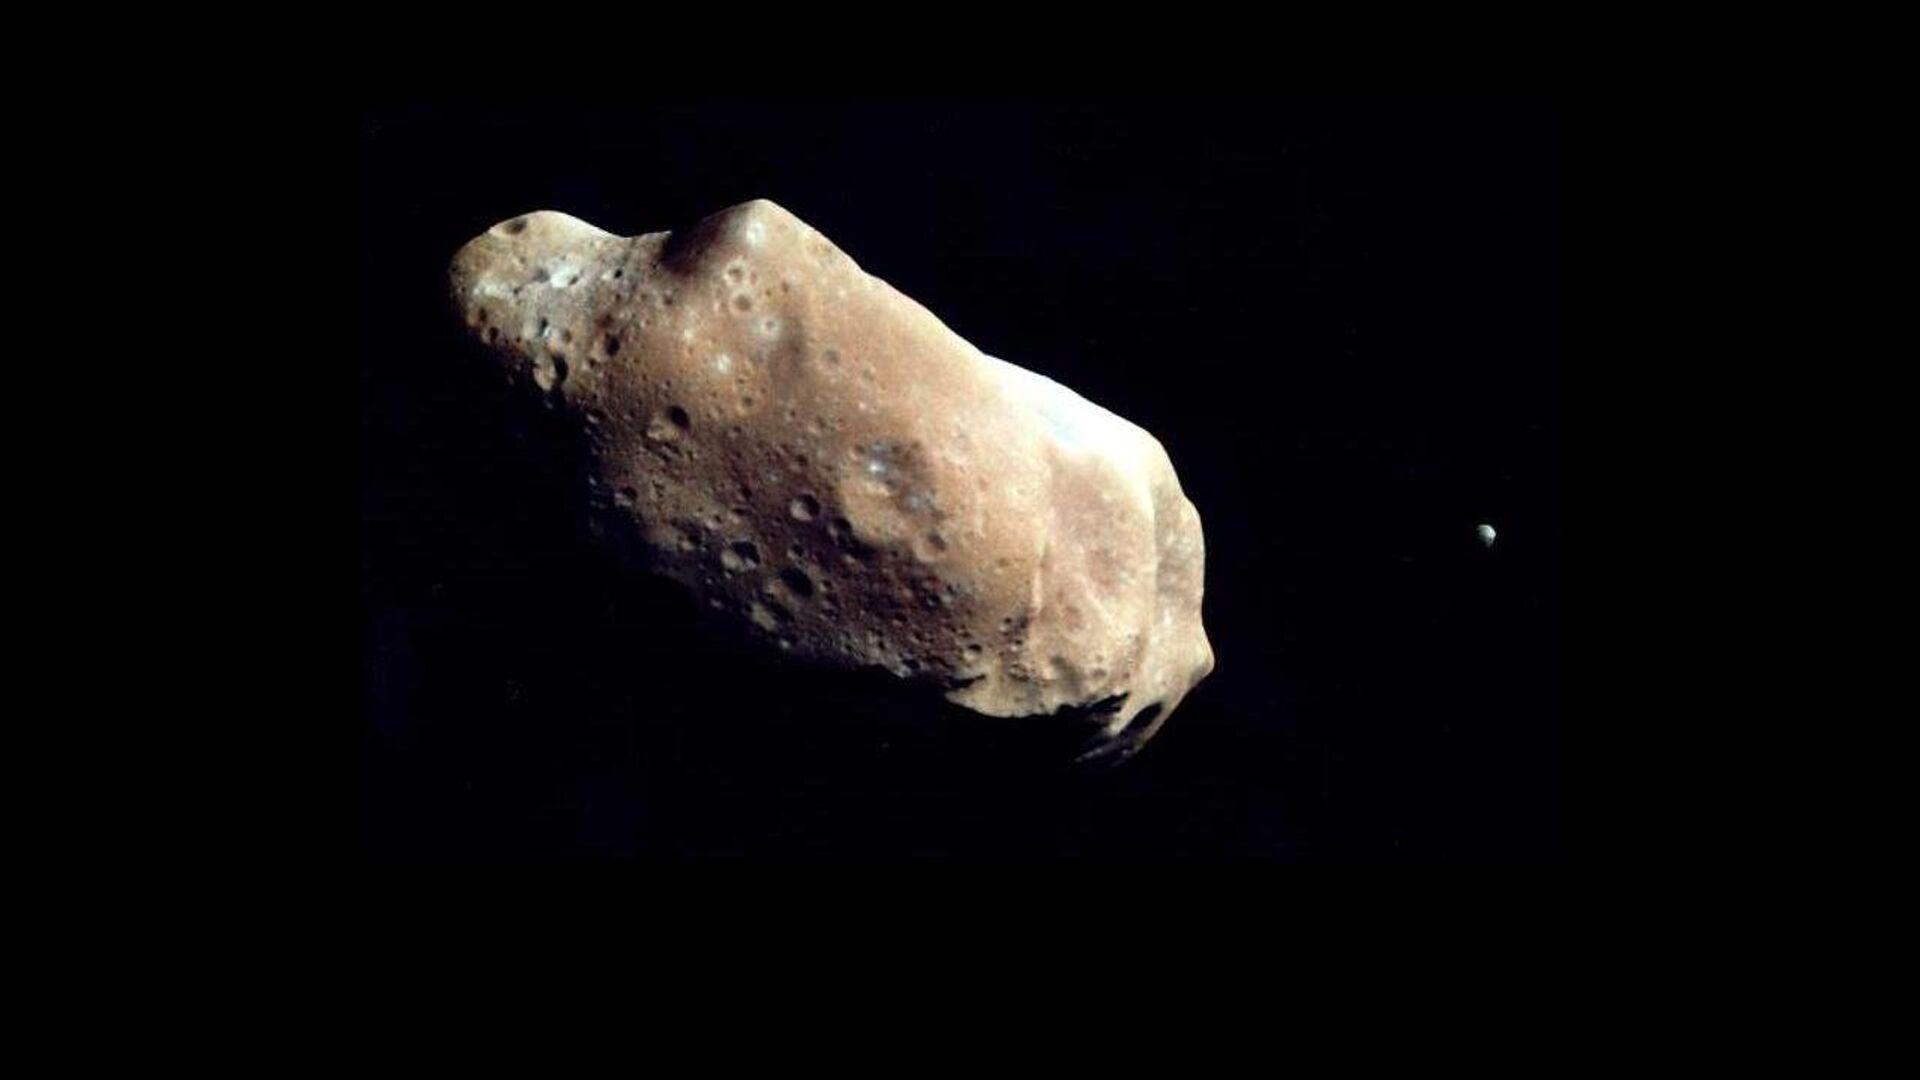 Un asteroide (imagen referencial) - Sputnik Mundo, 1920, 20.06.2021